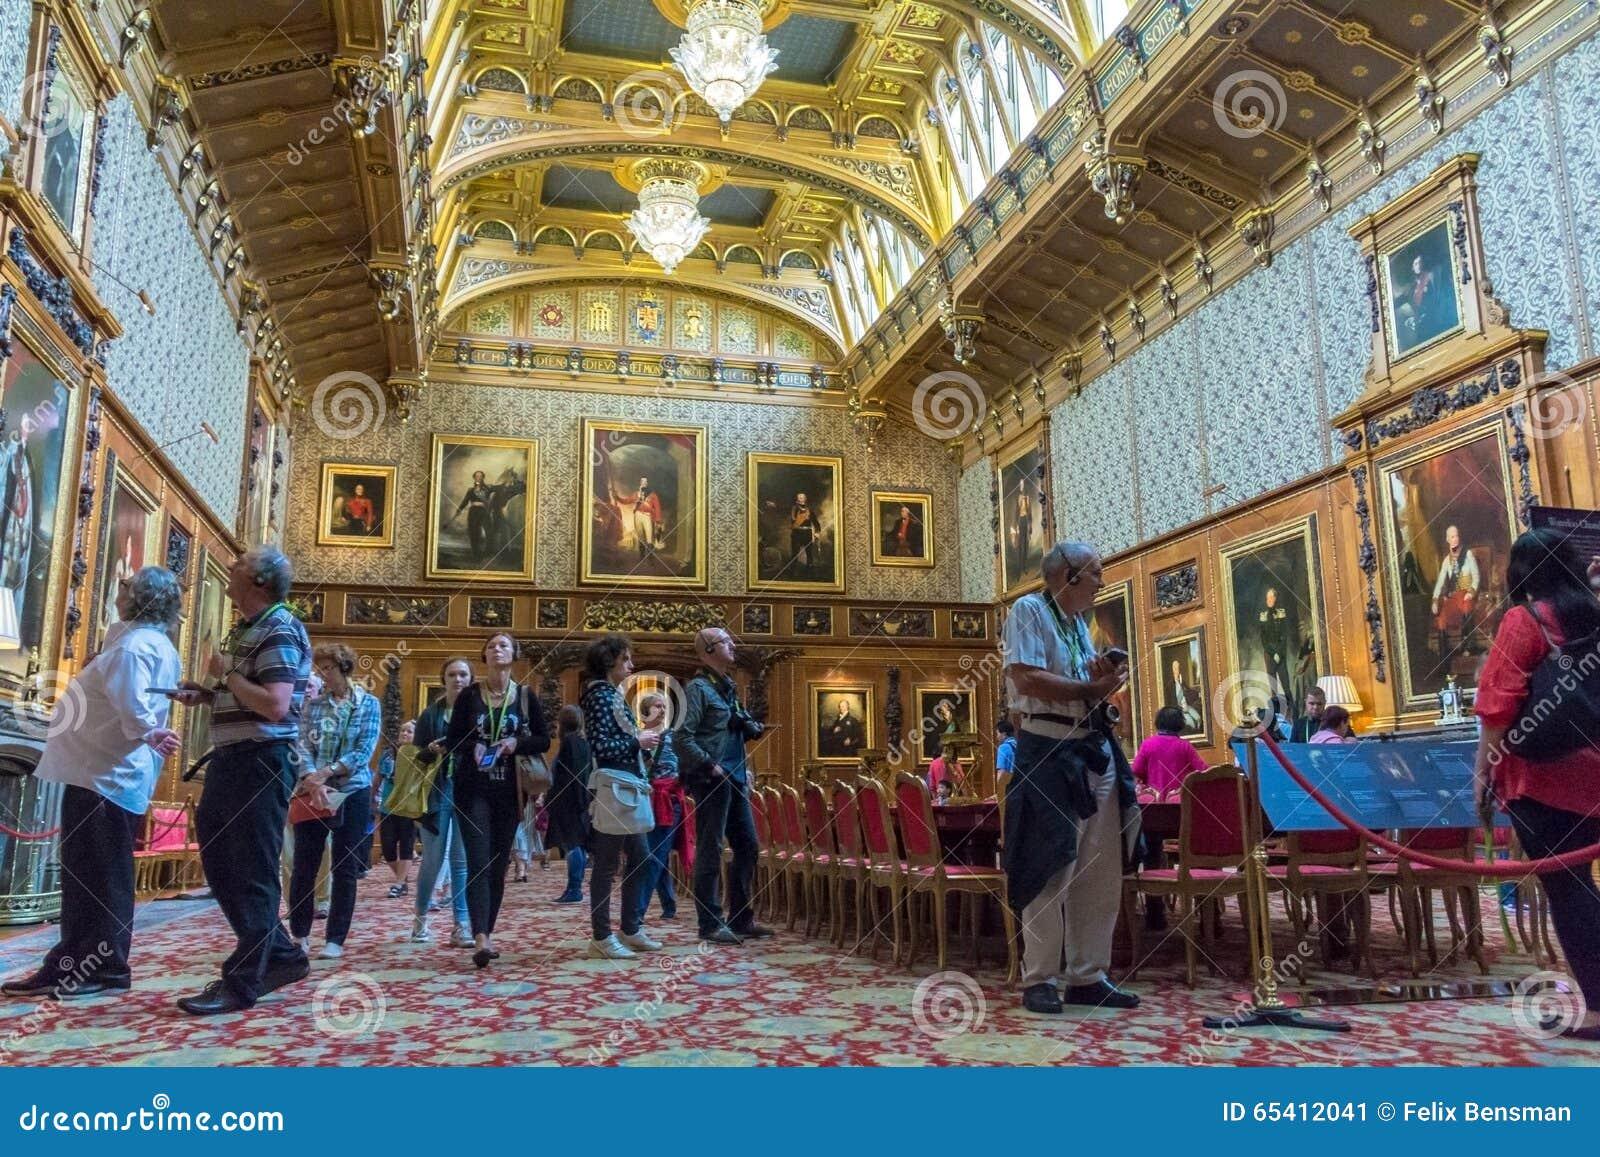 Interior of royal palace in medieval windsor castle uk for Interieur windsor